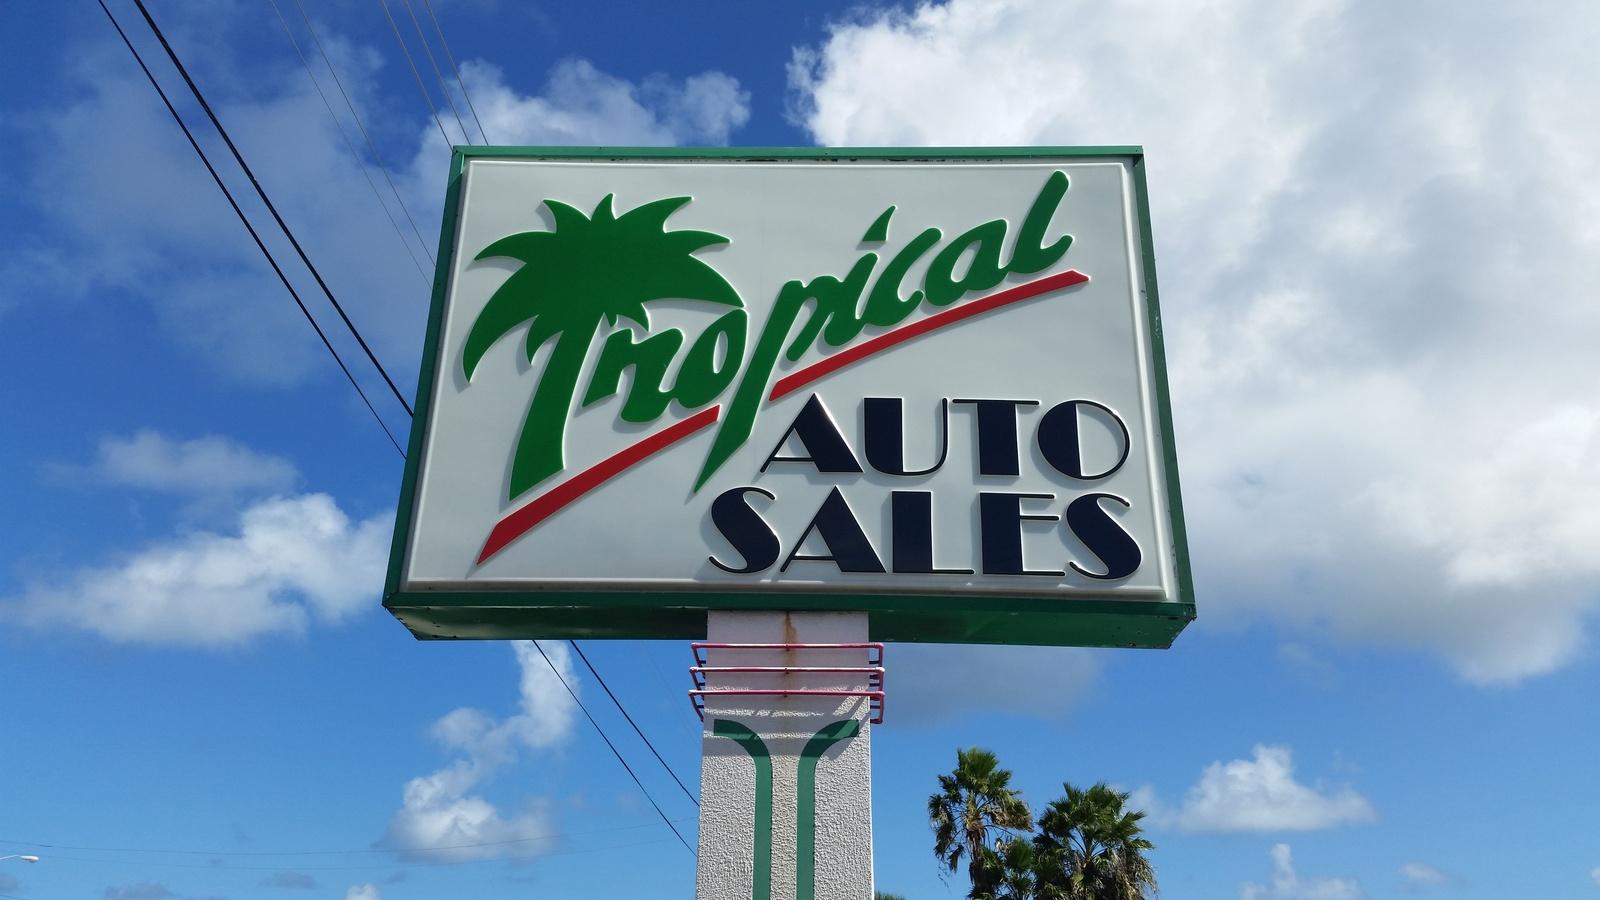 Mercedes Of Northlake >> Tropical Auto Sales - North Palm Beach, FL: Read Consumer ...